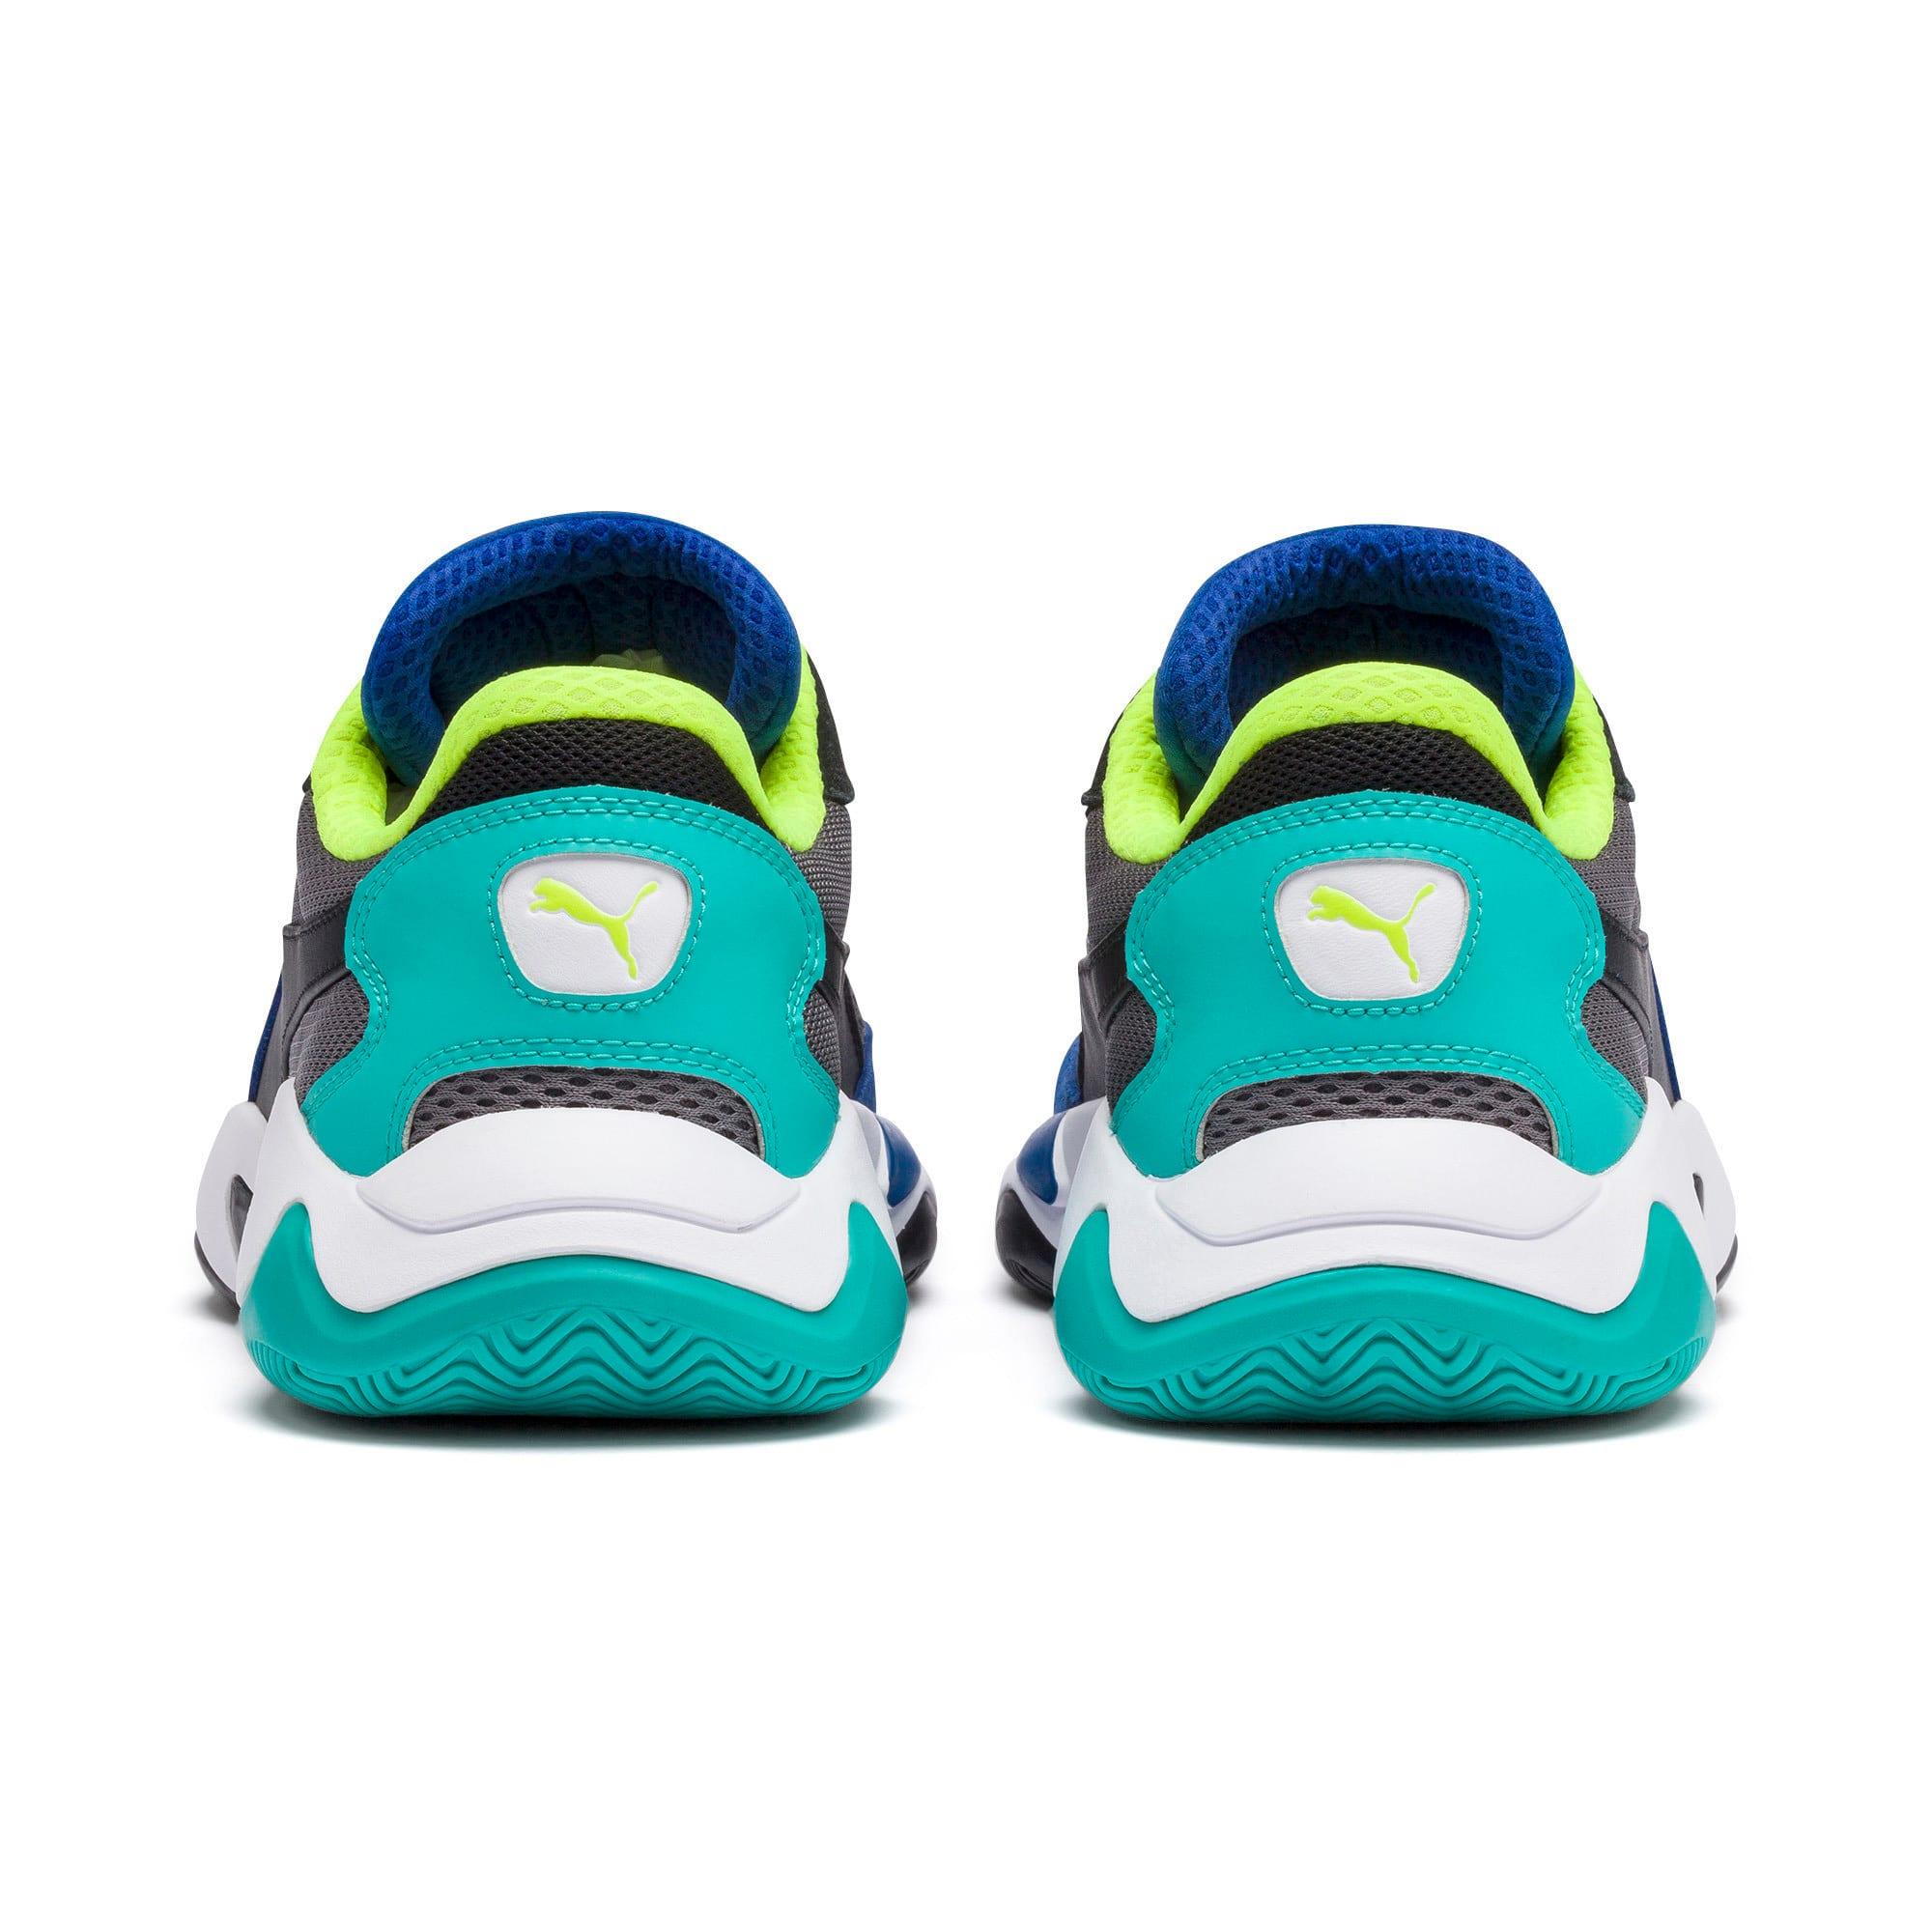 Thumbnail 4 of Storm Origin Sneaker, Galaxy Blue-CASTLEROCK, medium